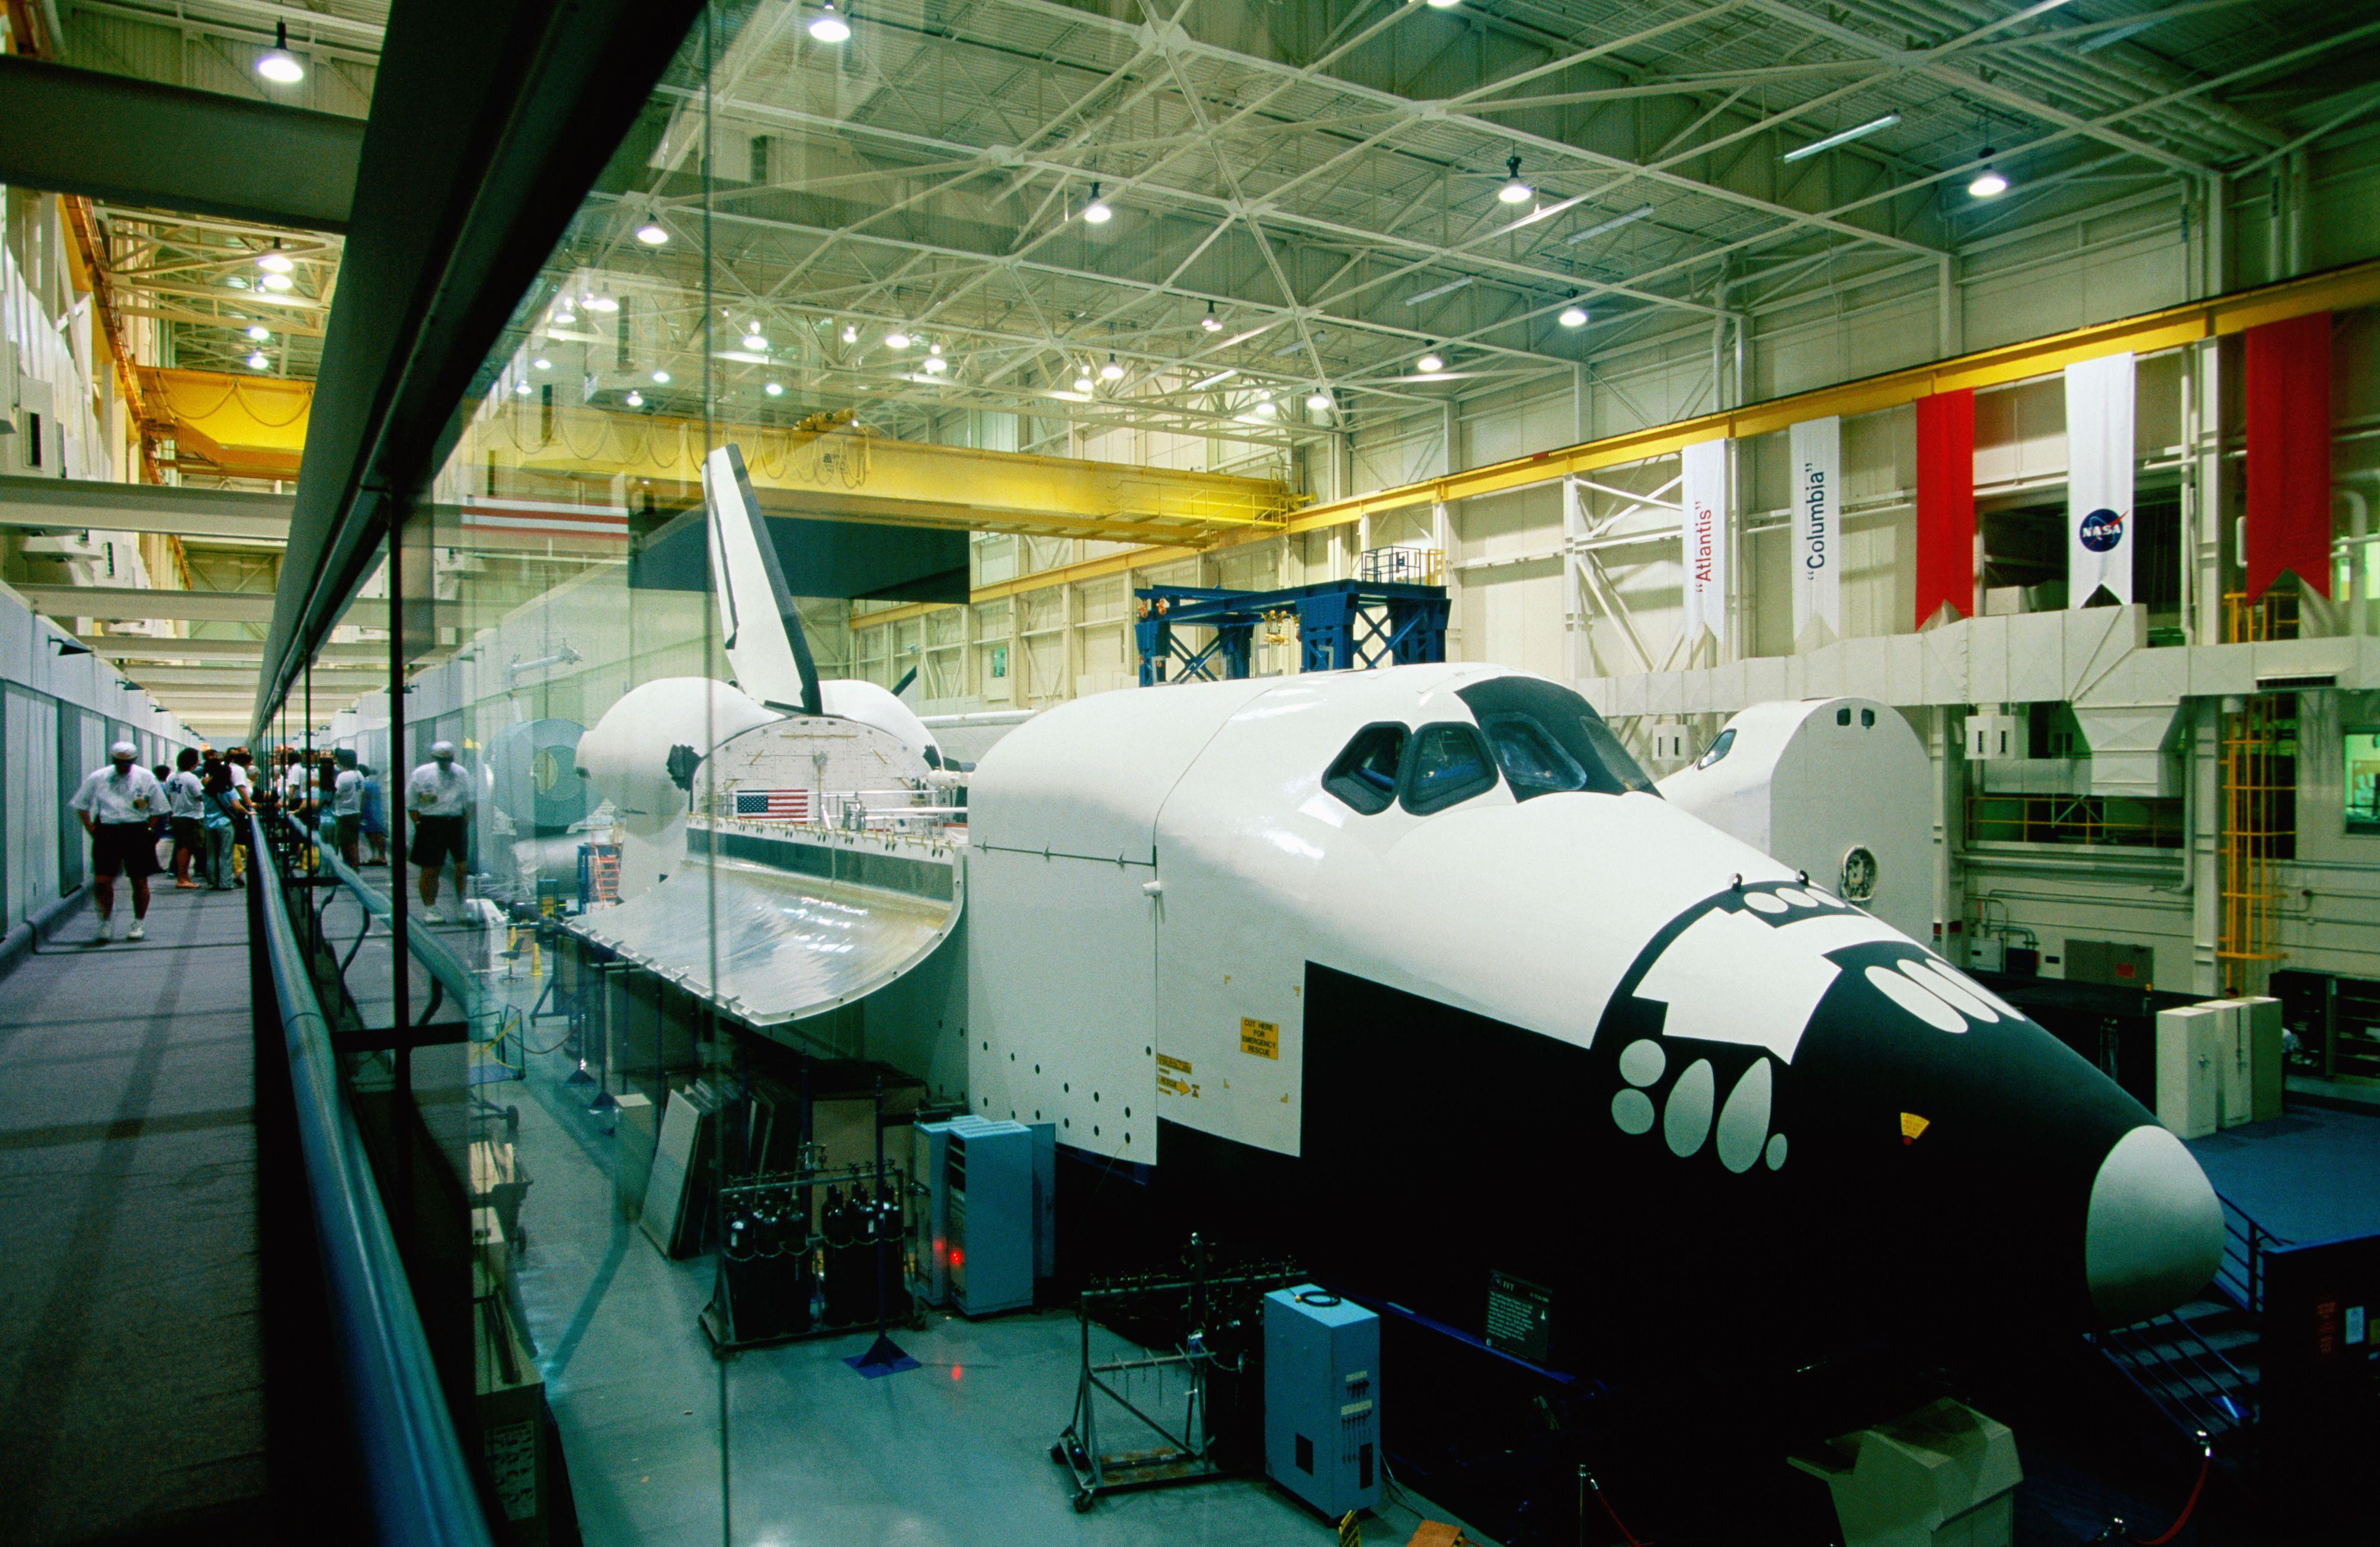 Training space shuttle, International Space Station Program, Johnson Space Center, Houston, Texas